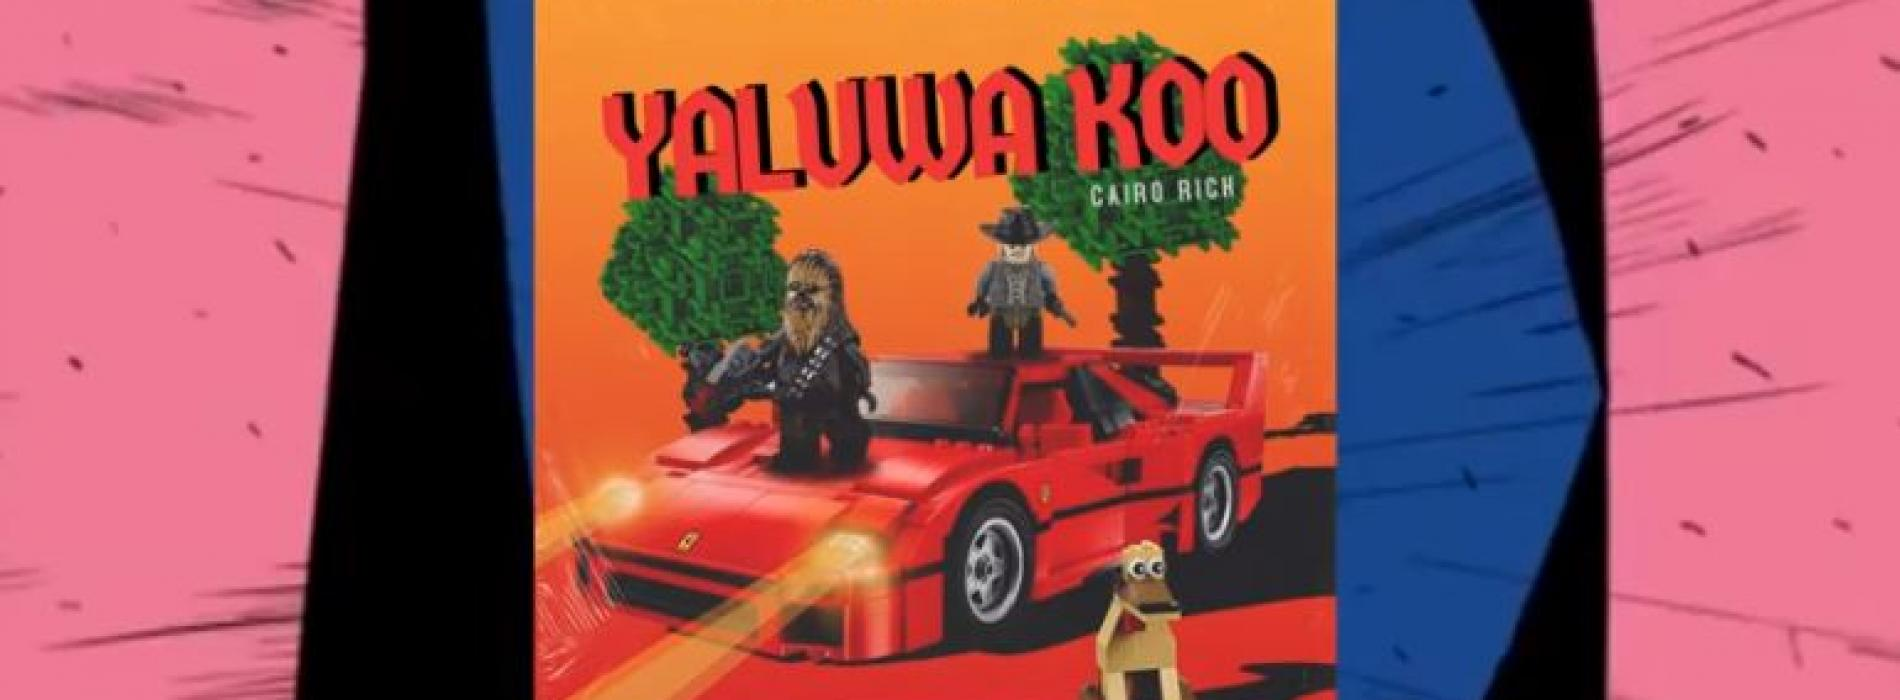 Cairo Rich – Yaluwa Koo (යාලුවා කෝ) Official Audio